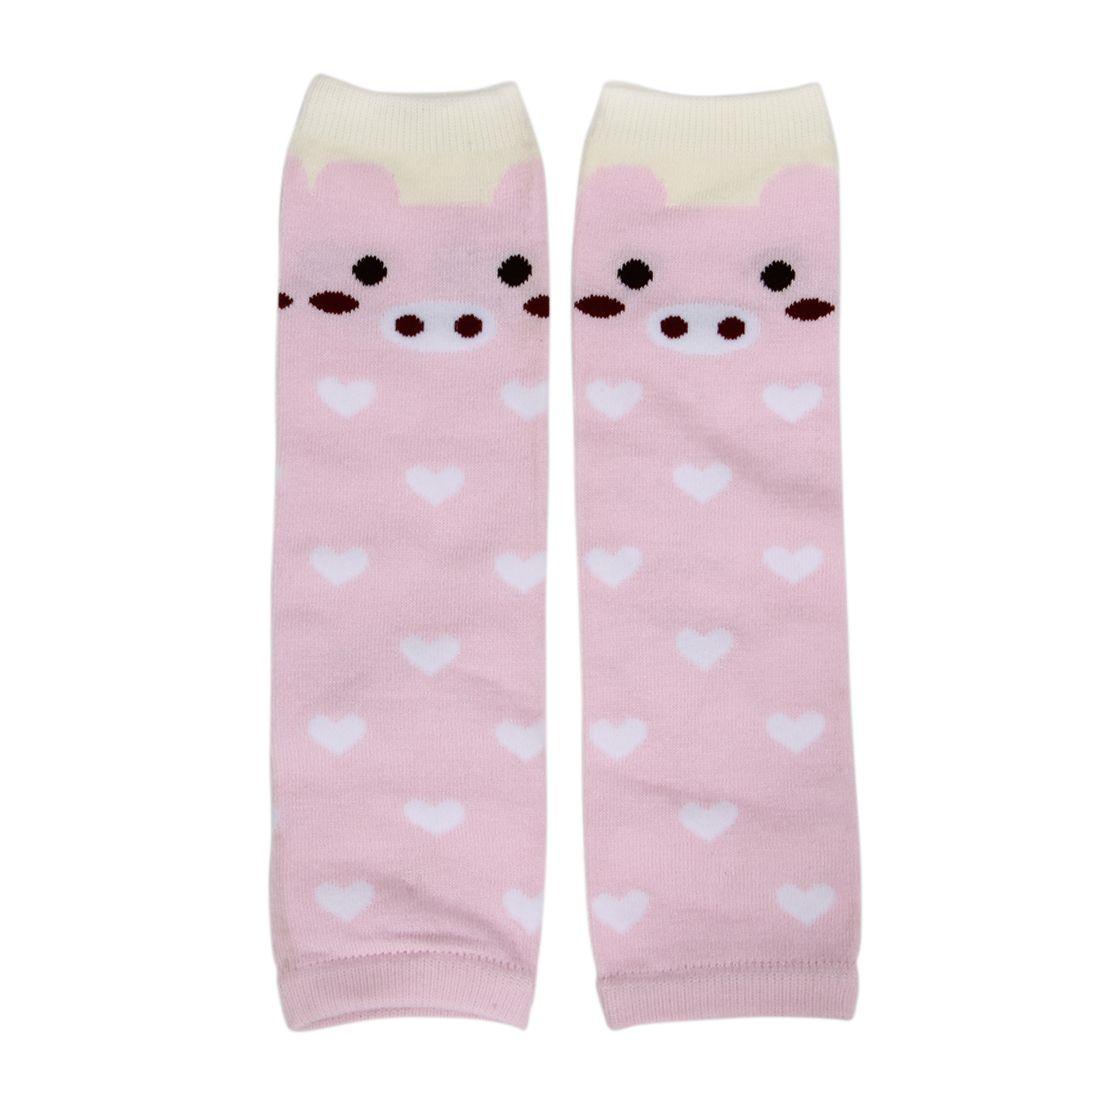 Leg Warmers Sock Kid Girl Boy Baby Filler Christmas Gift Present ...